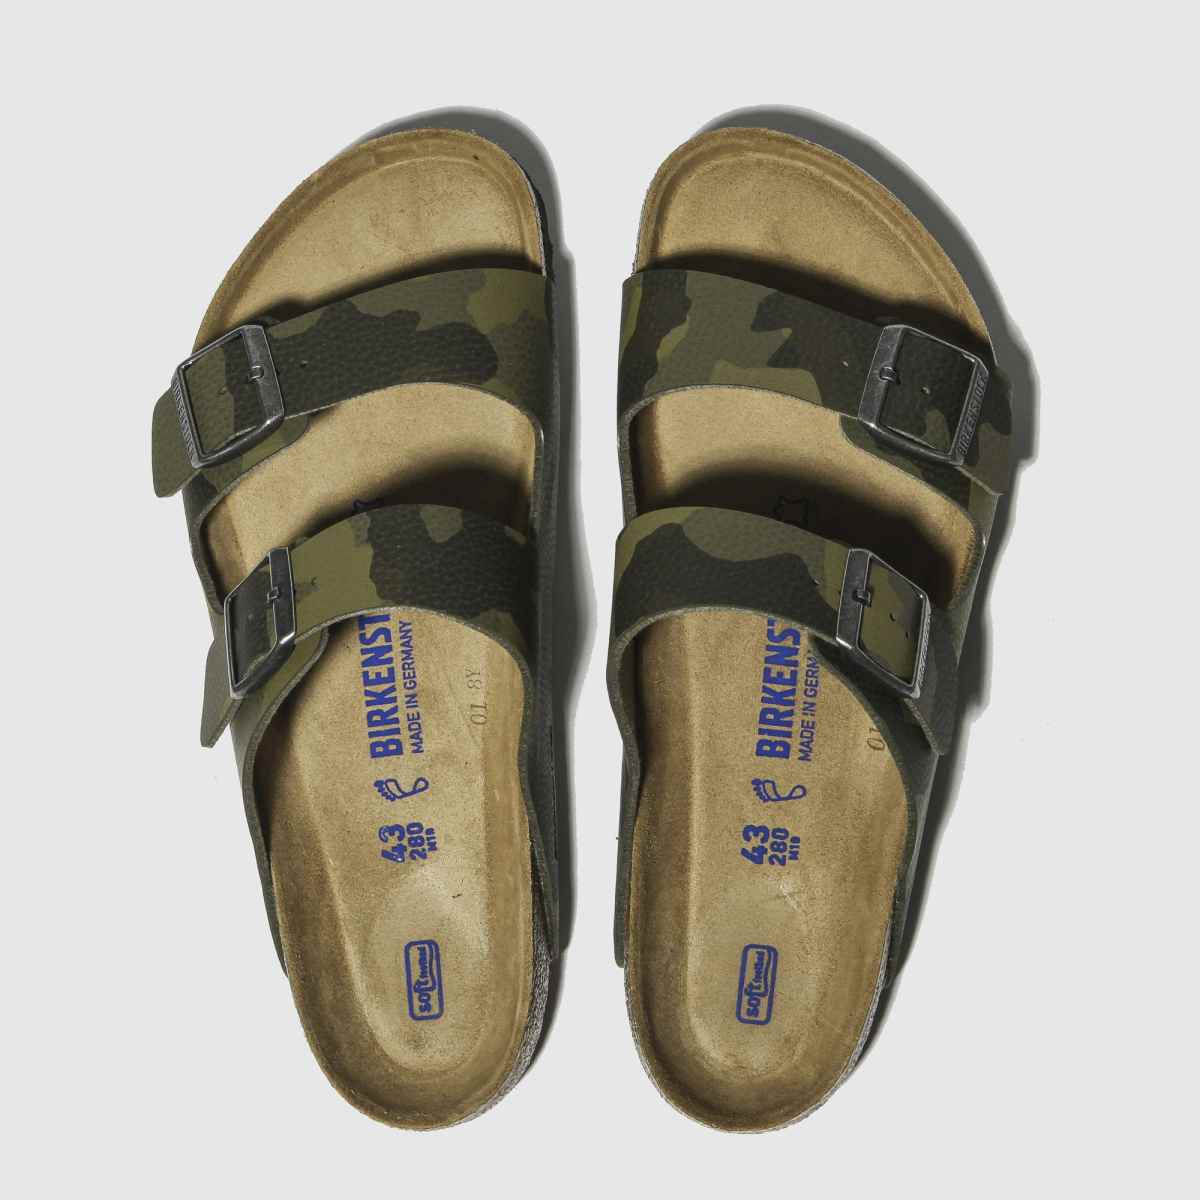 Birkenstock Khaki Arizona Soft Footbed Sandals